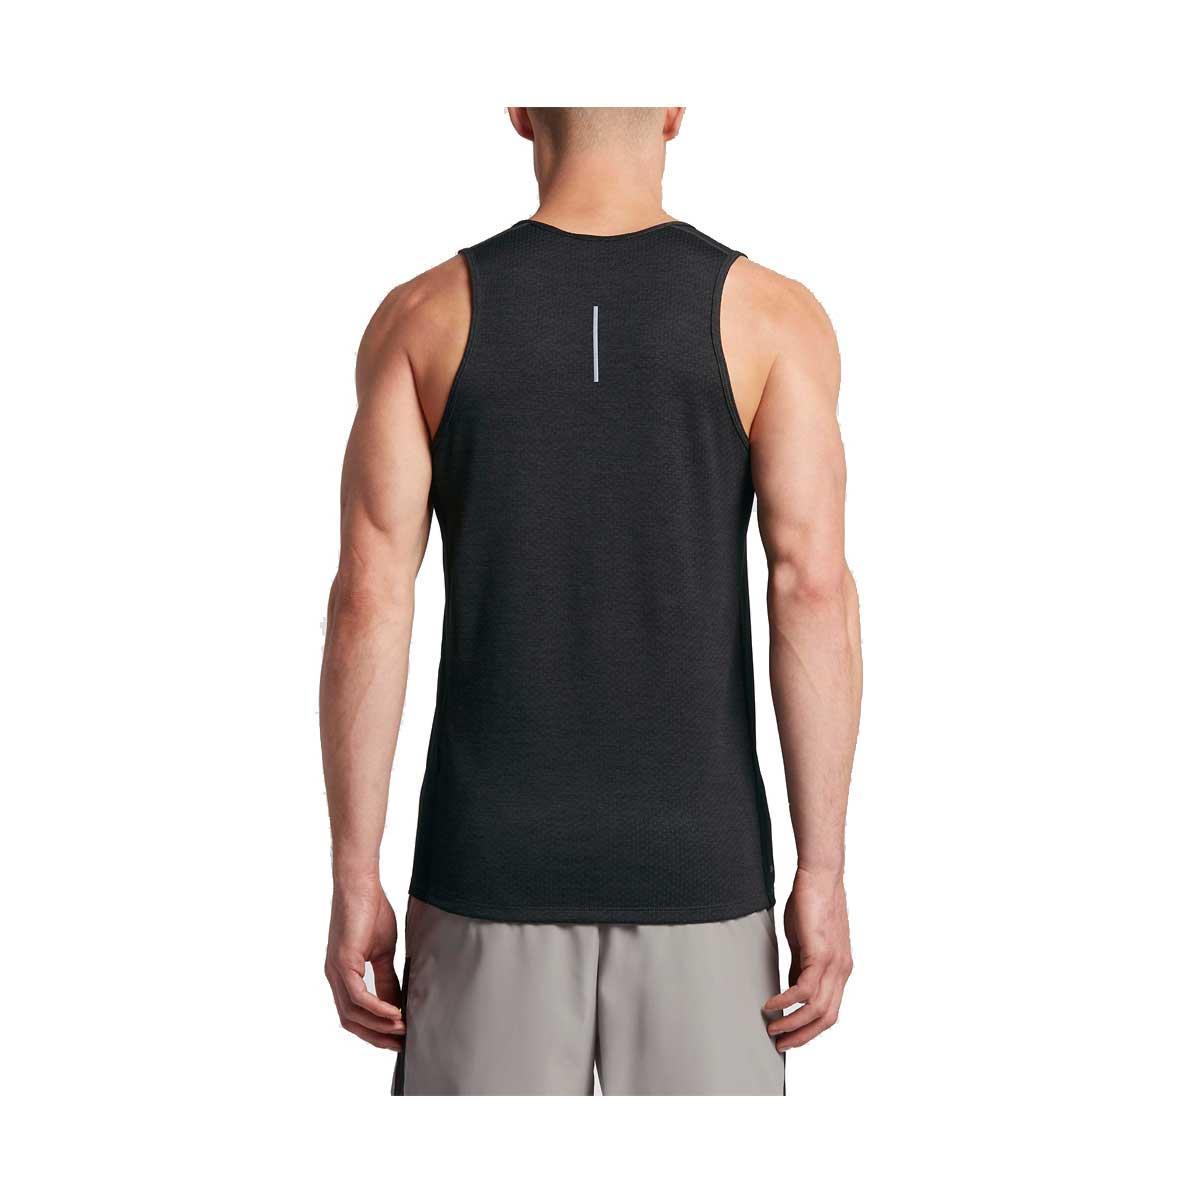 77848fba09b03 Camiseta Regata Nike Dry Miler Cool Masculino